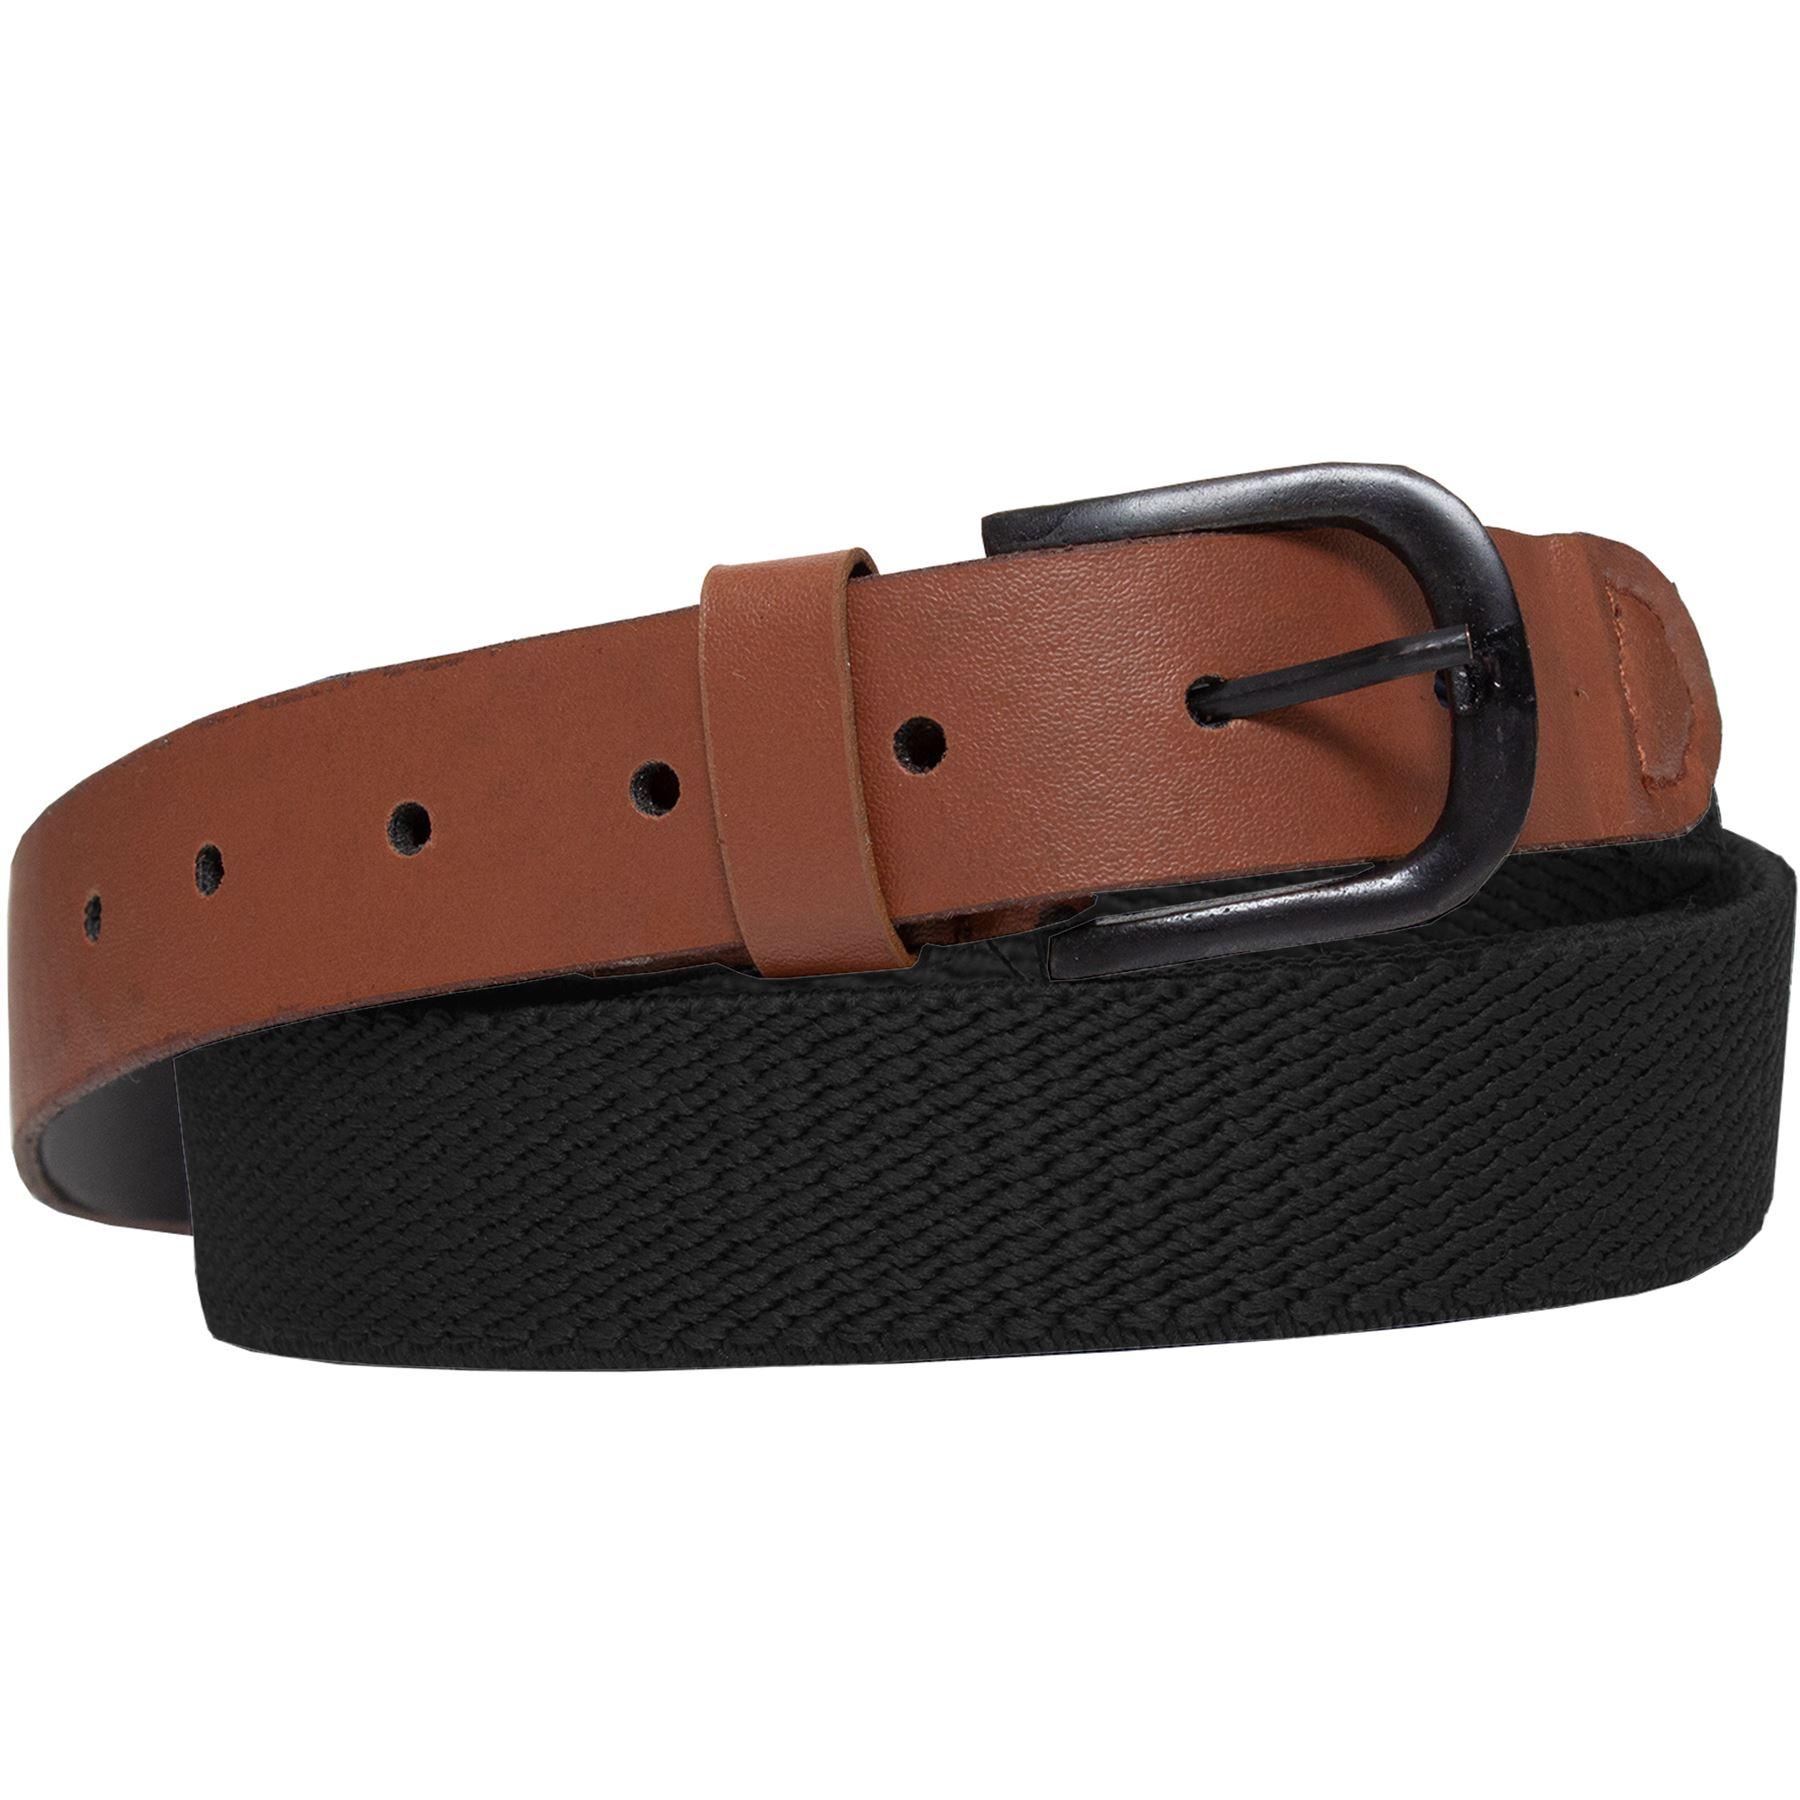 ENZO-Mens-Womens-Elasticated-Belts-Canvas-Stretch-PU-Leather-Trim-Braided-Belt Indexbild 11